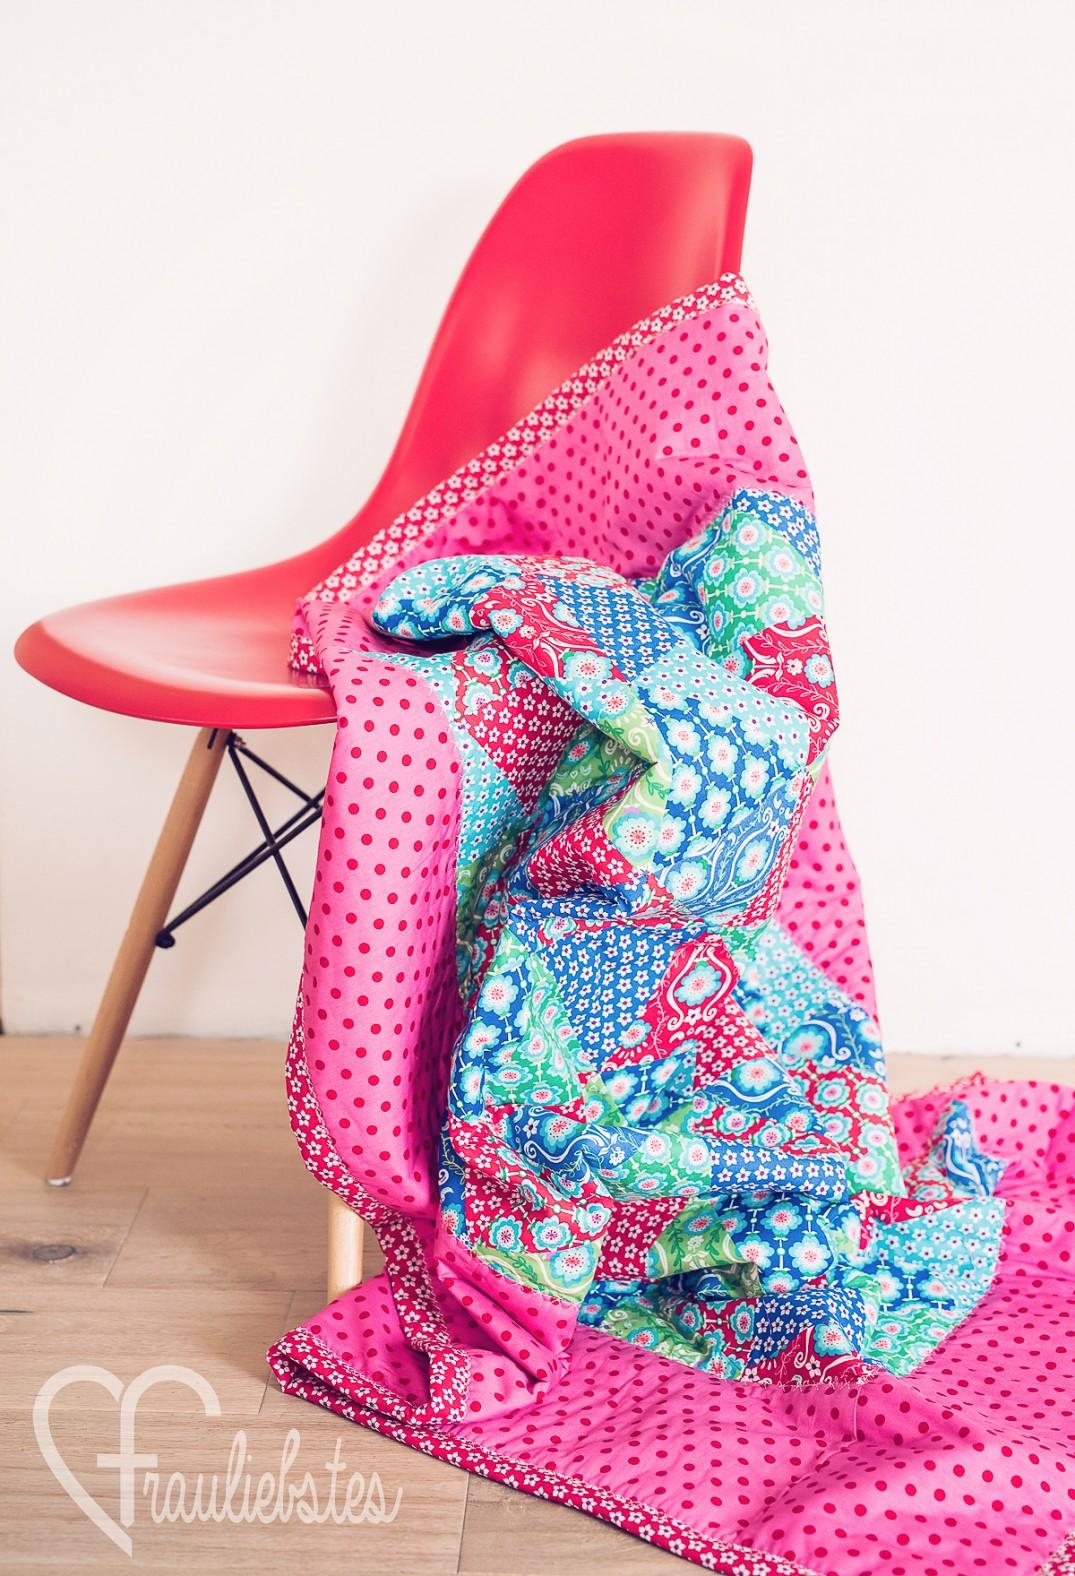 sommerkollektion 2015 jolijou patchwork schultüte frau liebstes-3